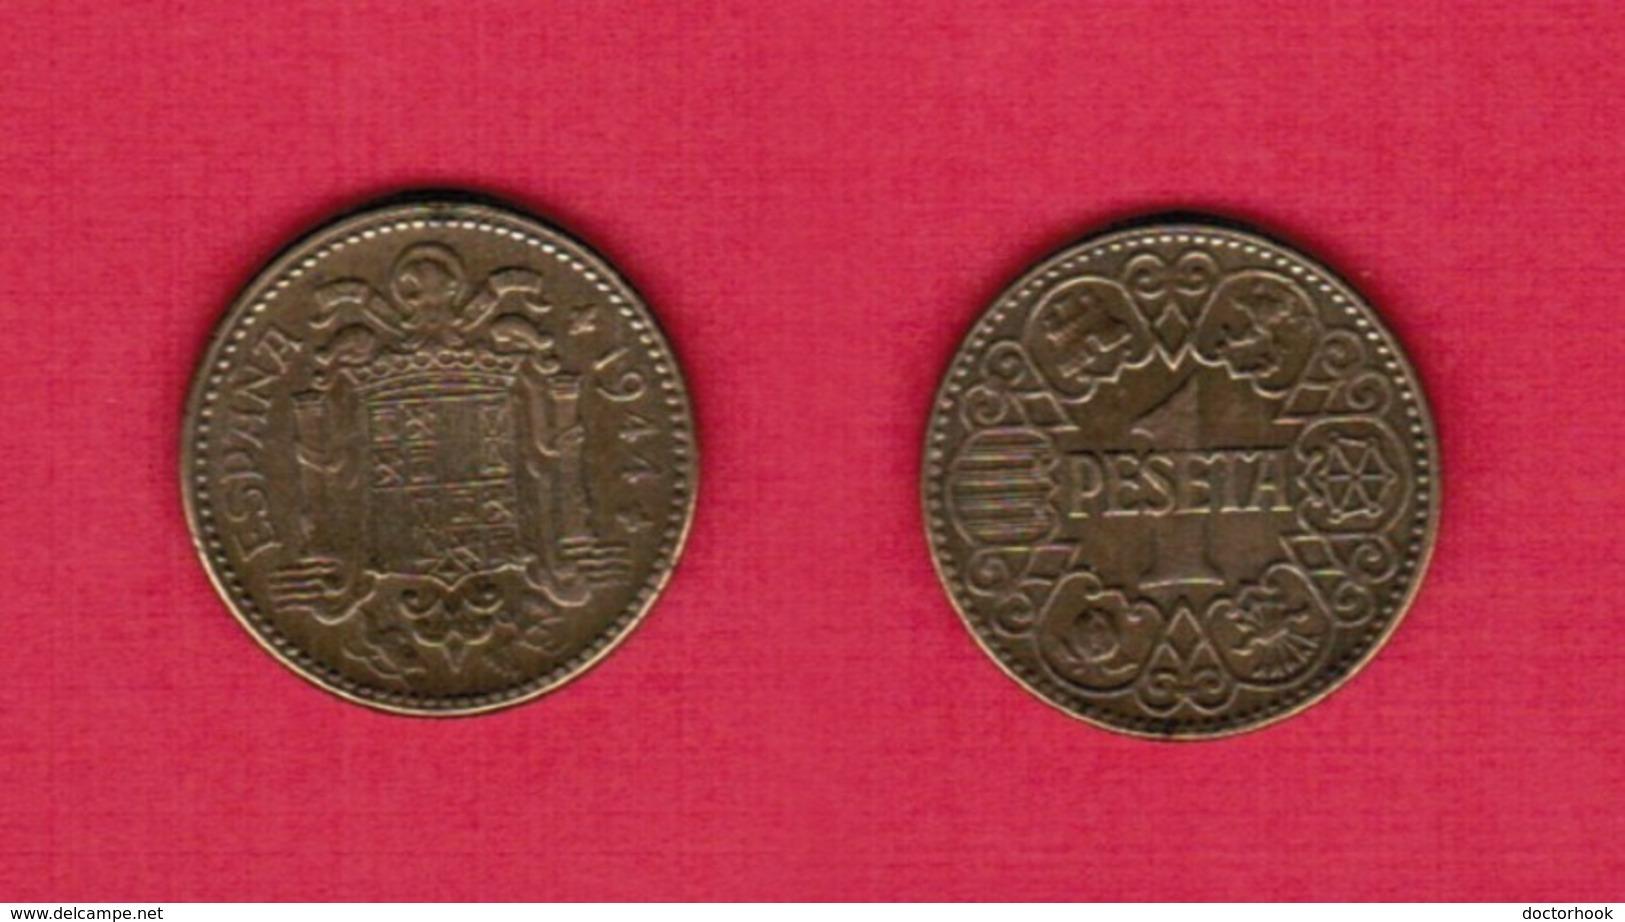 SPAIN  1 PESETA 1944 (KM # 767) #6156 - 1 Peseta